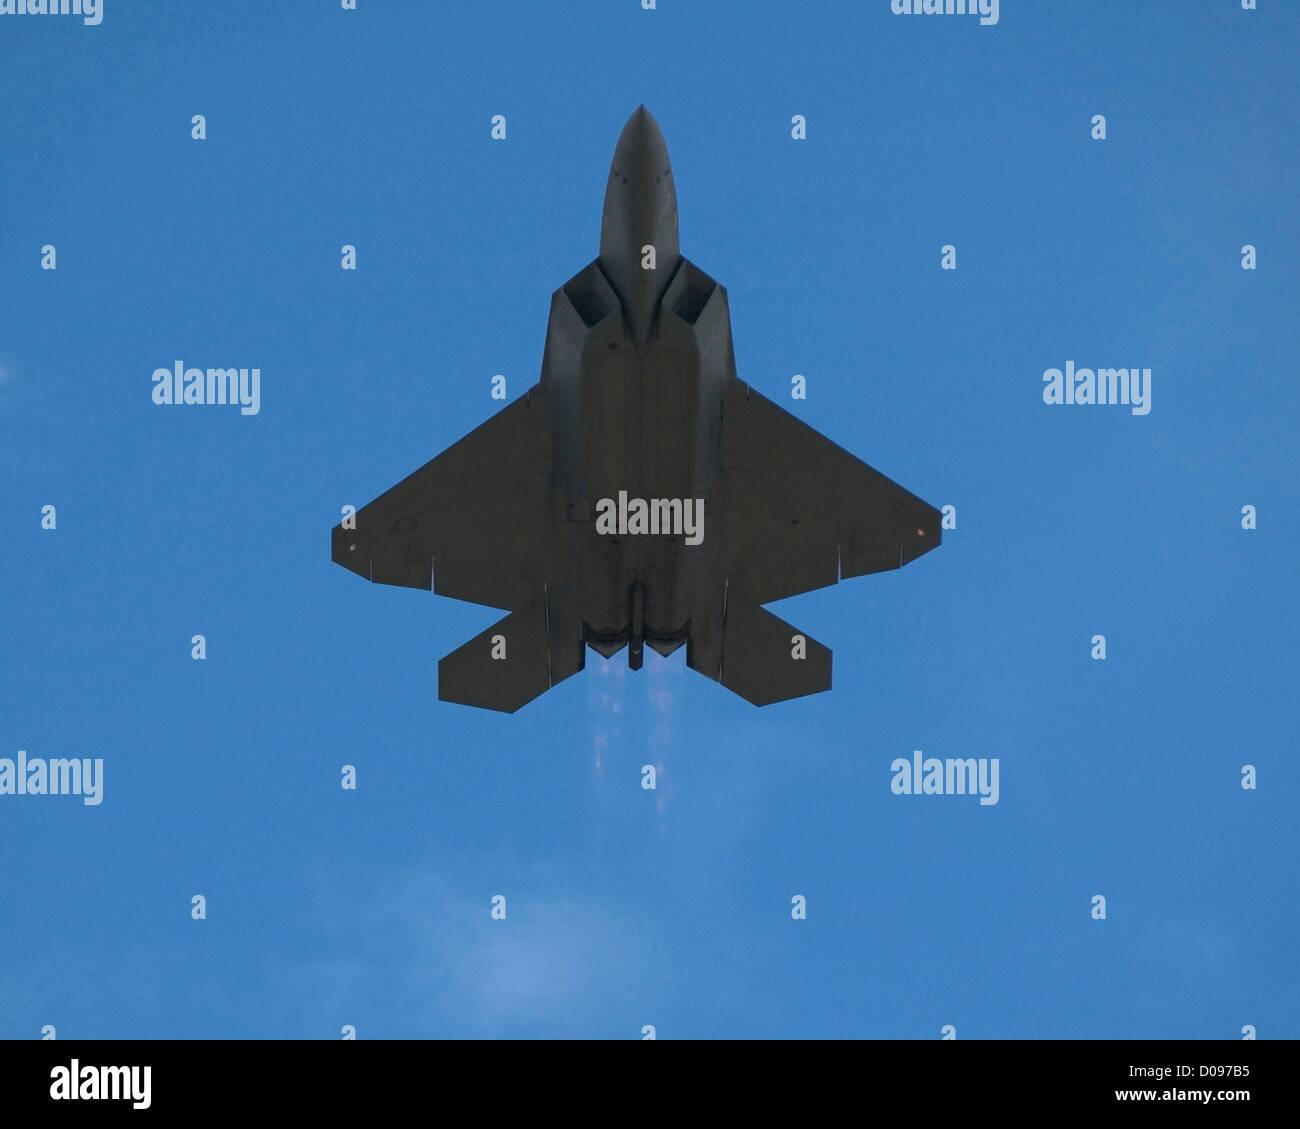 F-22 flying demo at the 2008 Farnborough International Airshow - Stock Image